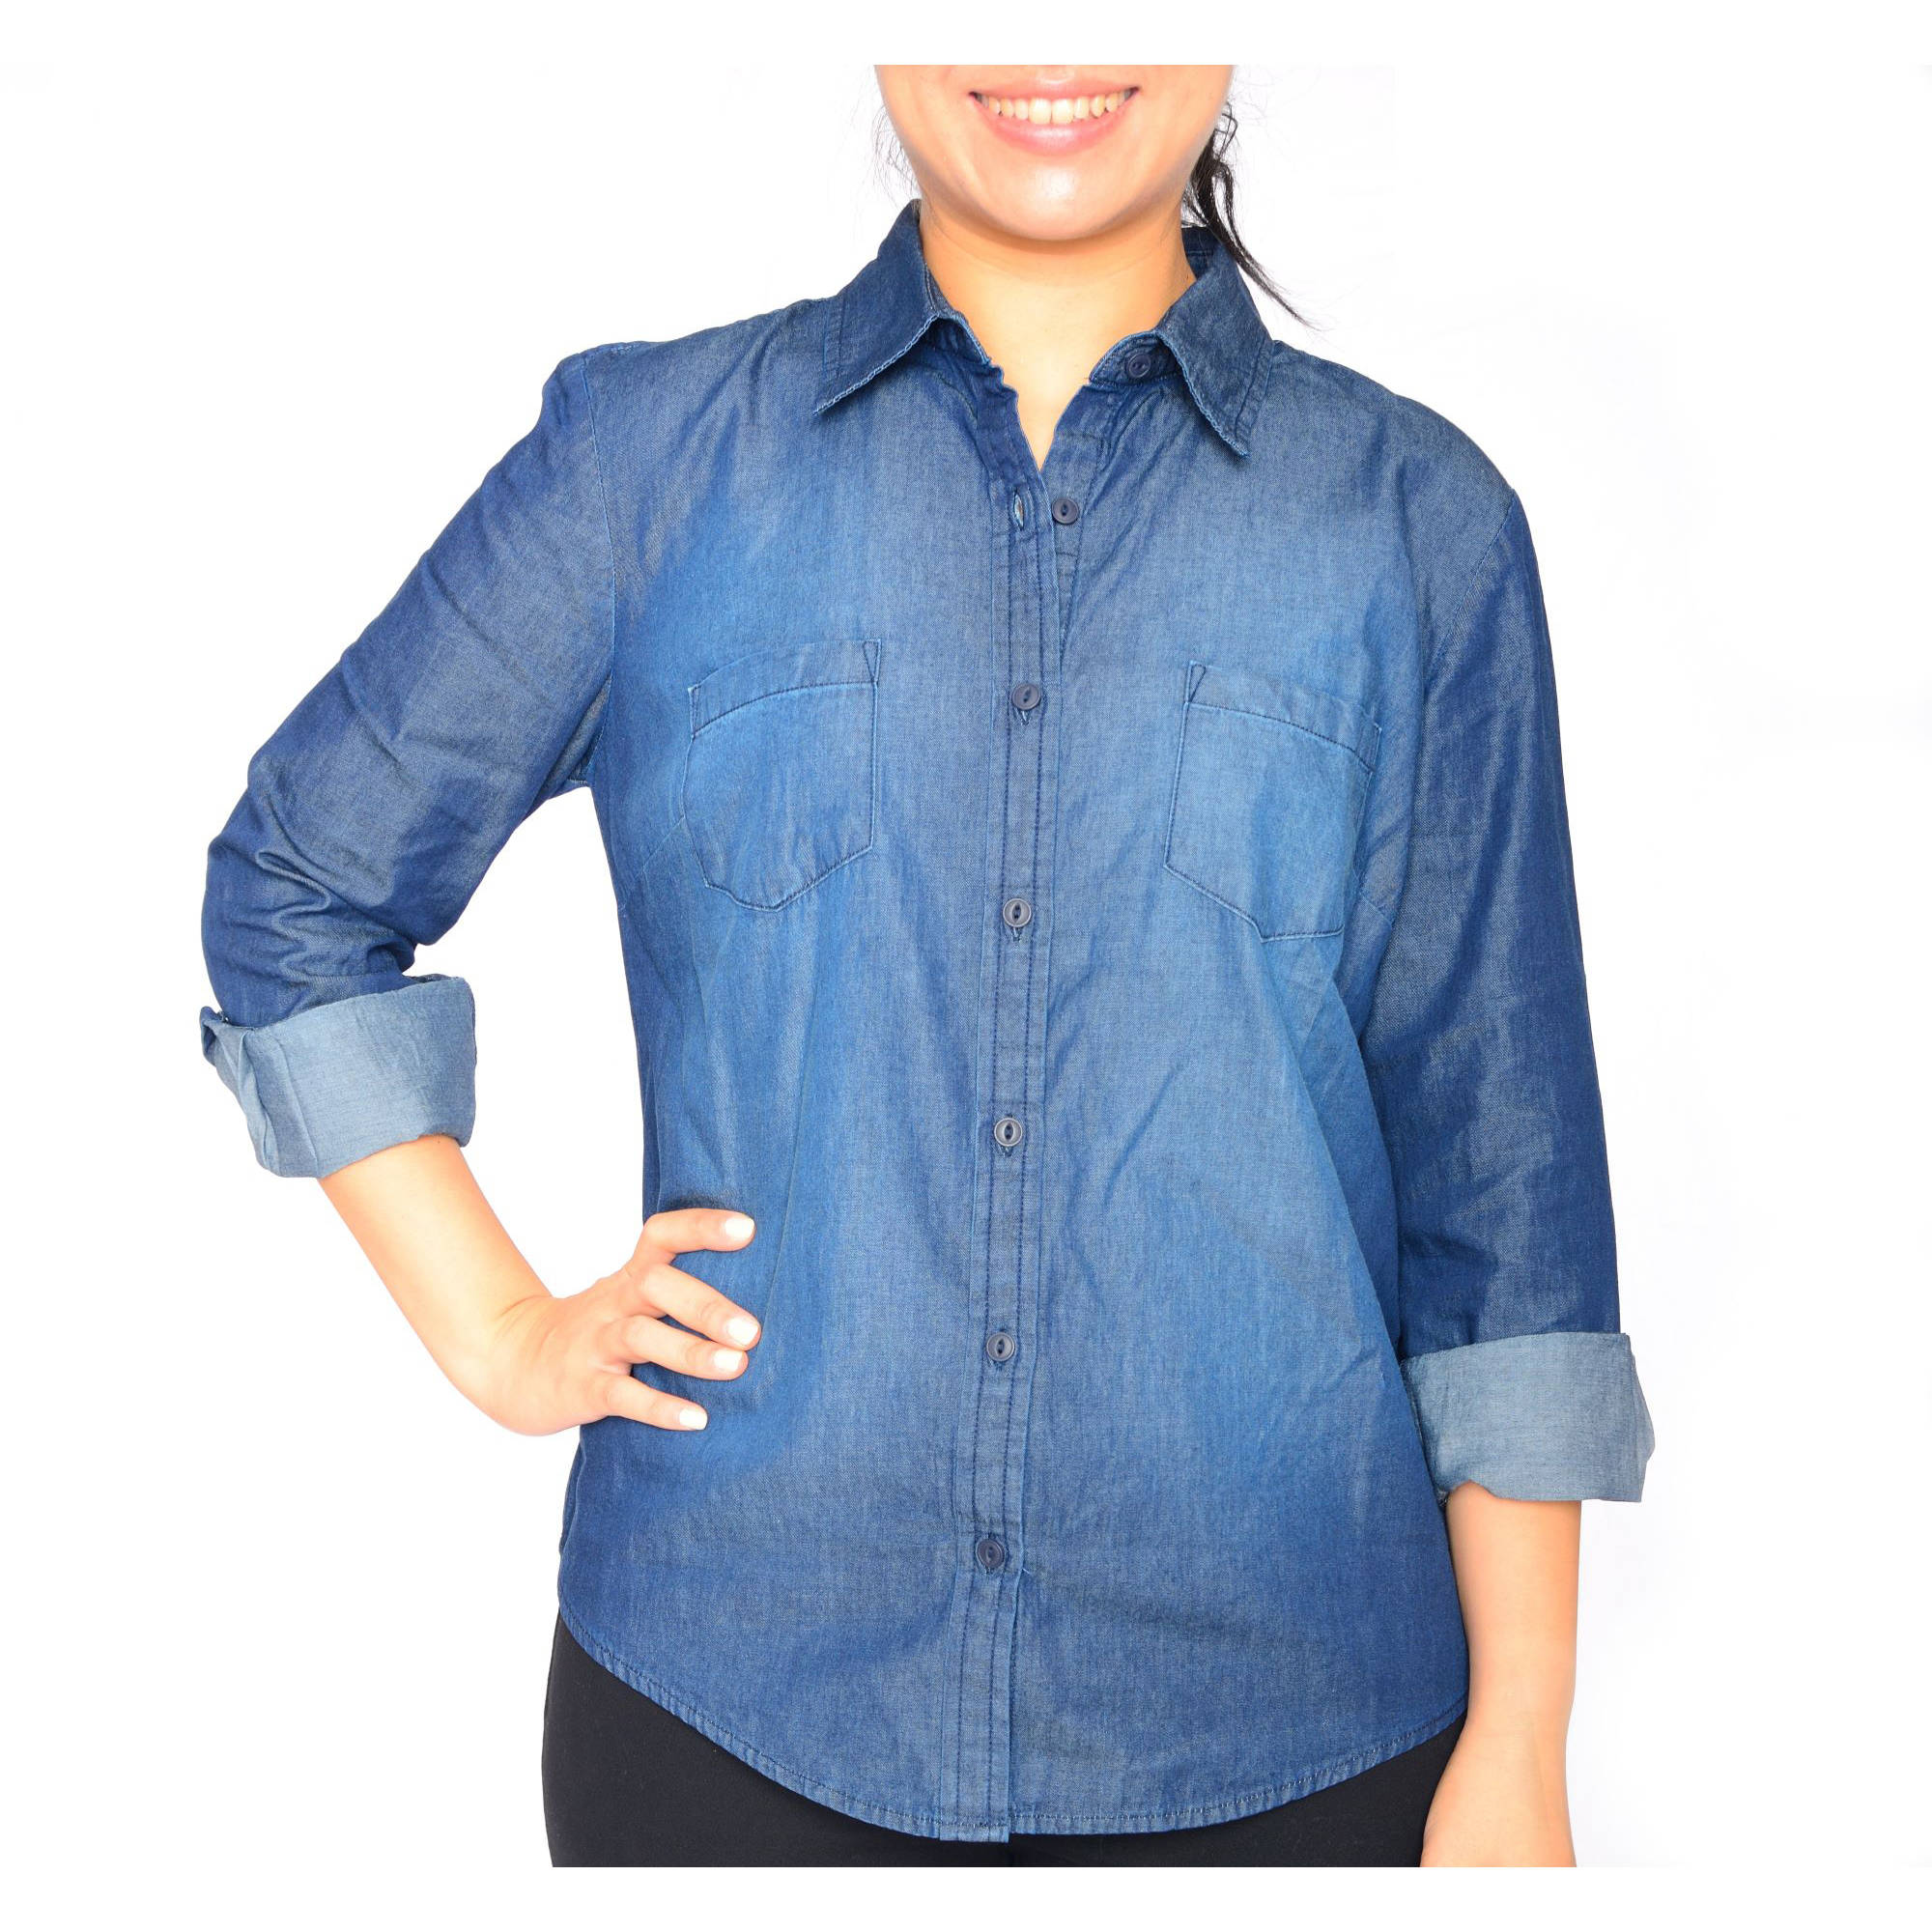 Faded Glory Women's Button Front Denim Shirt